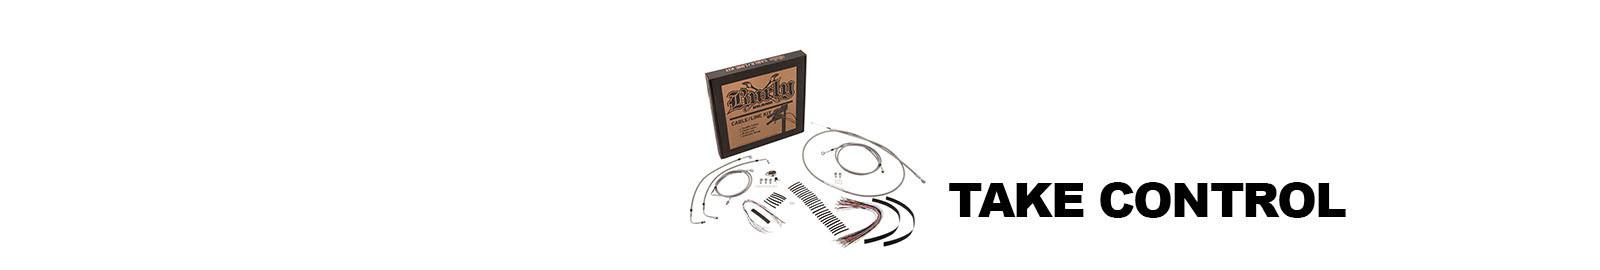 Burly Control Kits